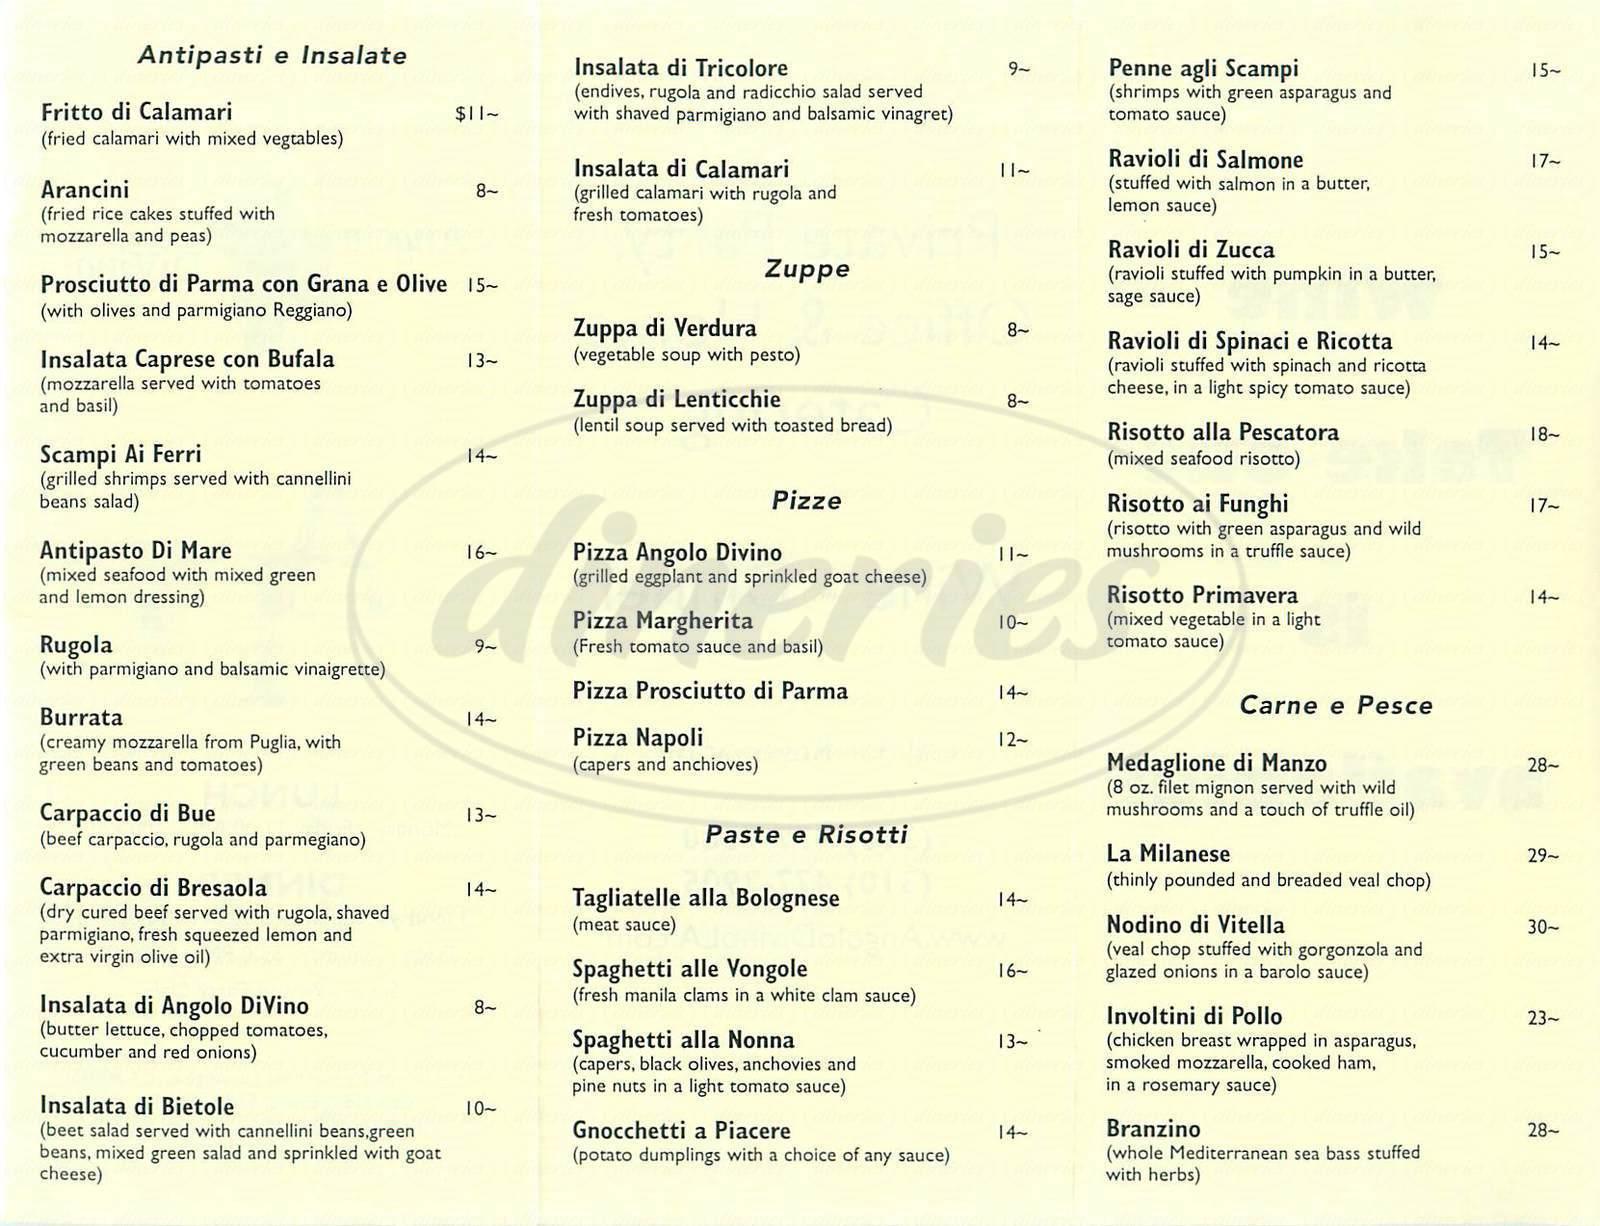 menu for Angolo Divino